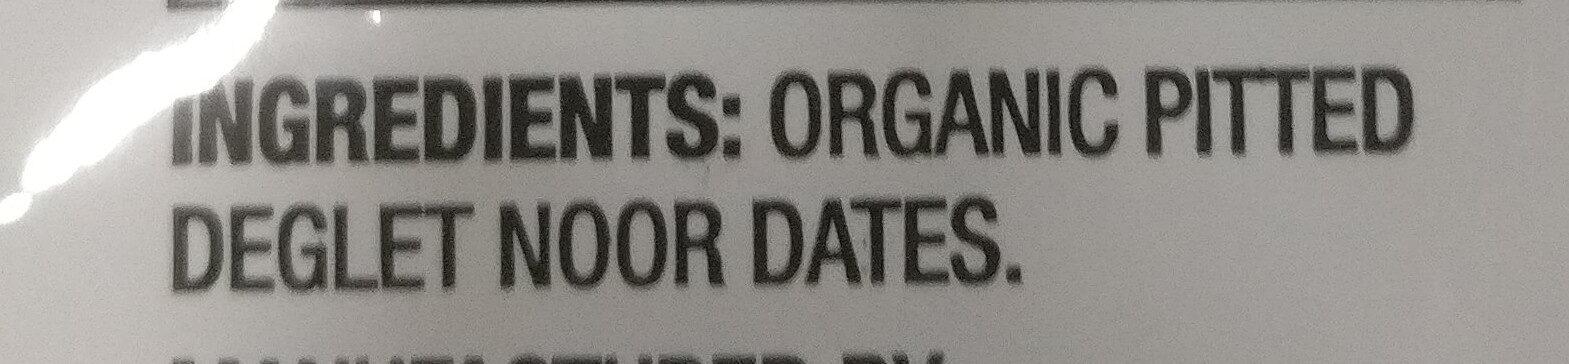 Organic Dried Dates - Ingrédients - en